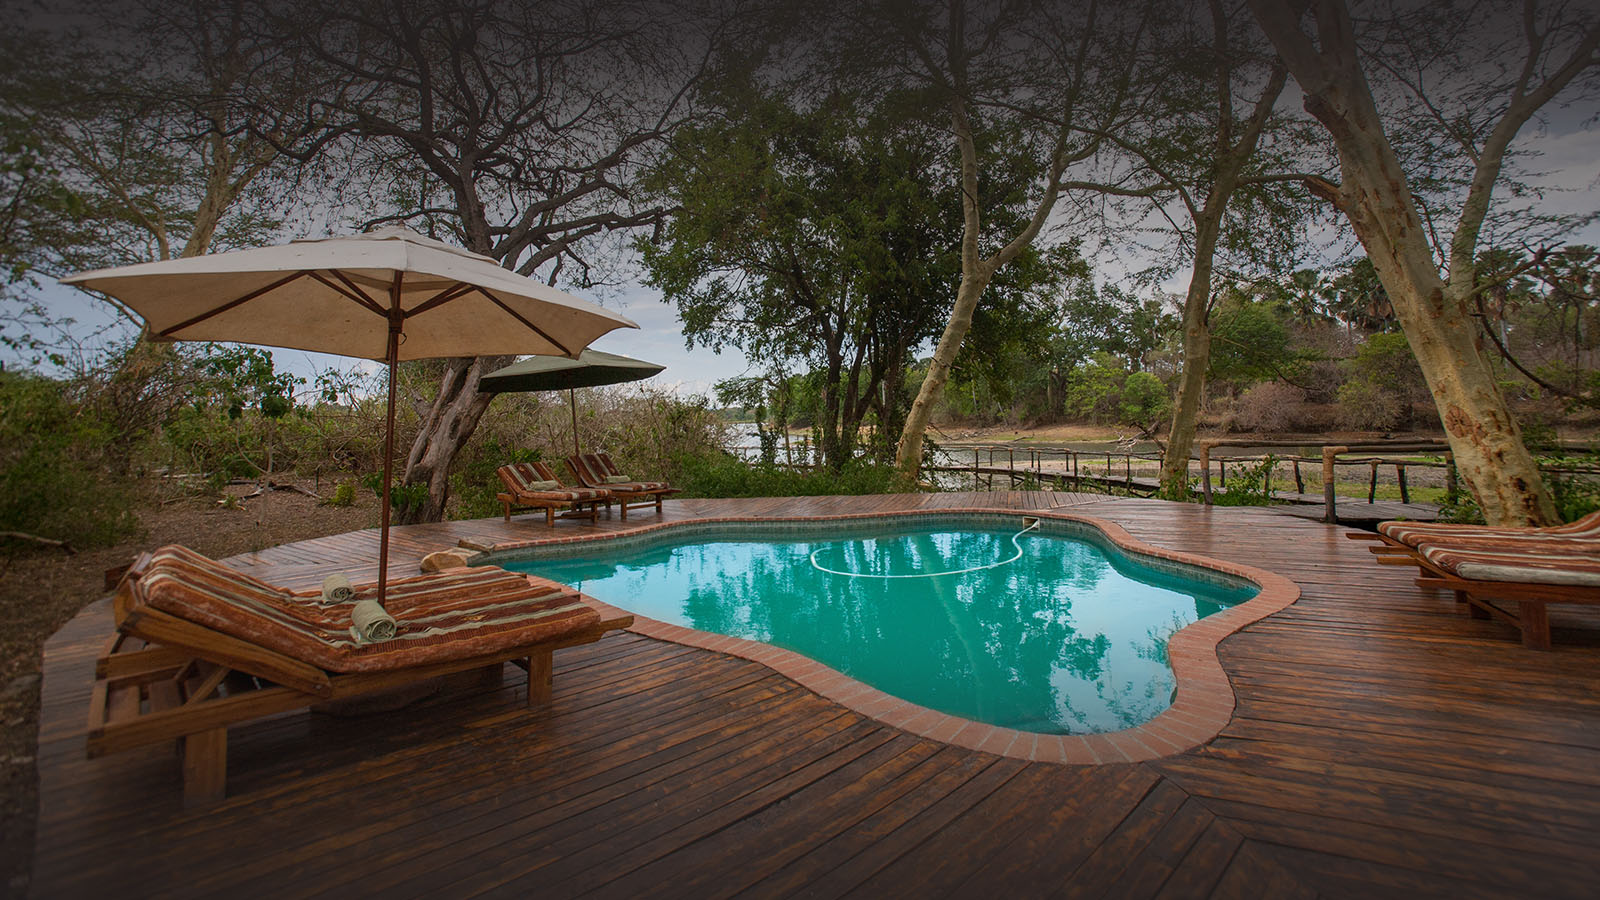 malawi-south-luangwa-green-season-zambia-in-style-safari-packages-tours-luxury-lodge-swimming-pool